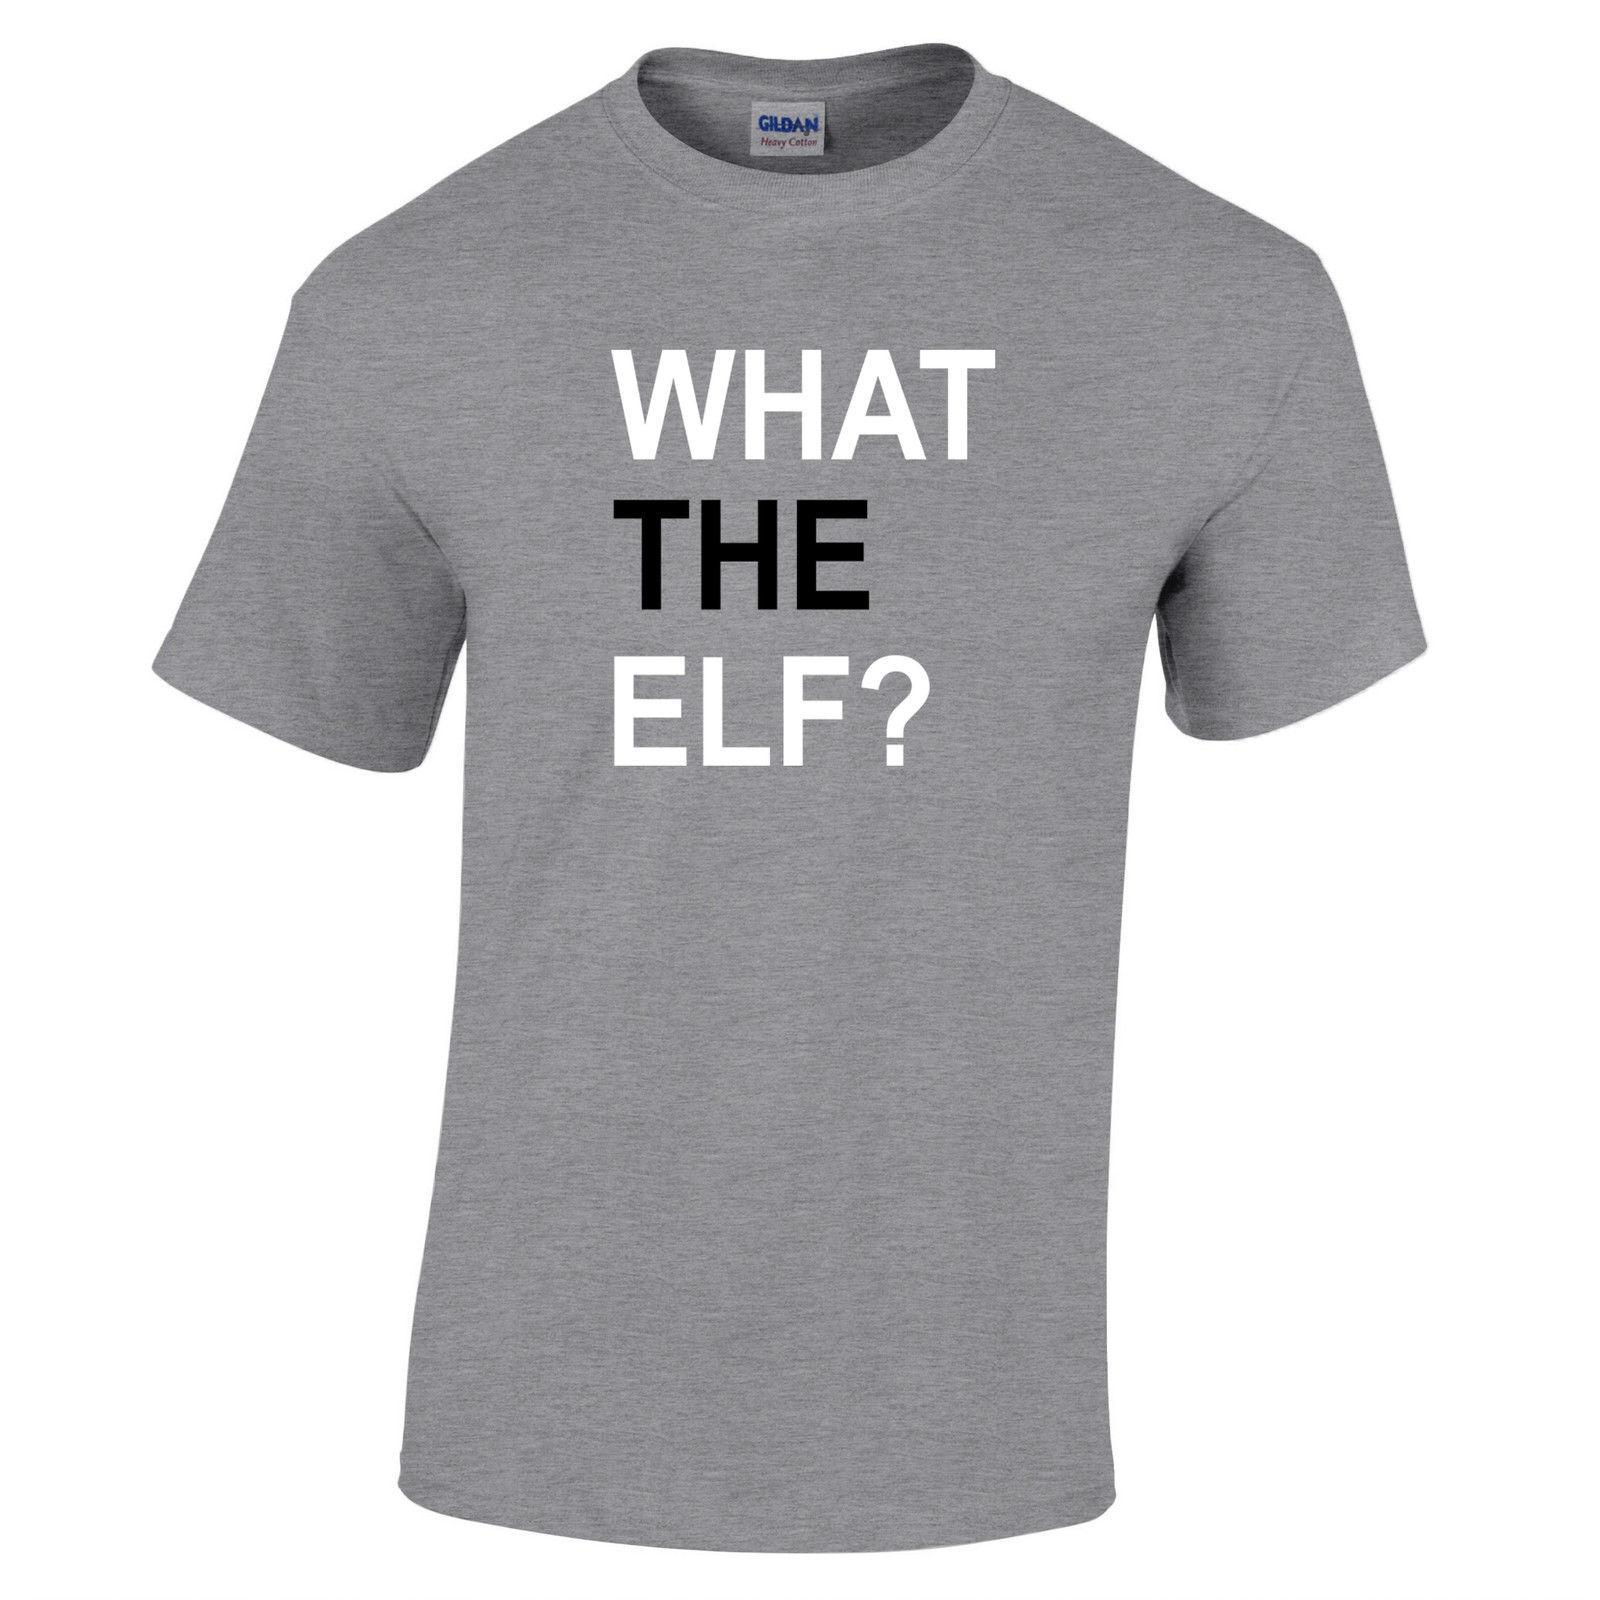 Shirt design companies - Company T Shirt Design What The Elf Men S Comfort Soft O Neck Short Sleeve